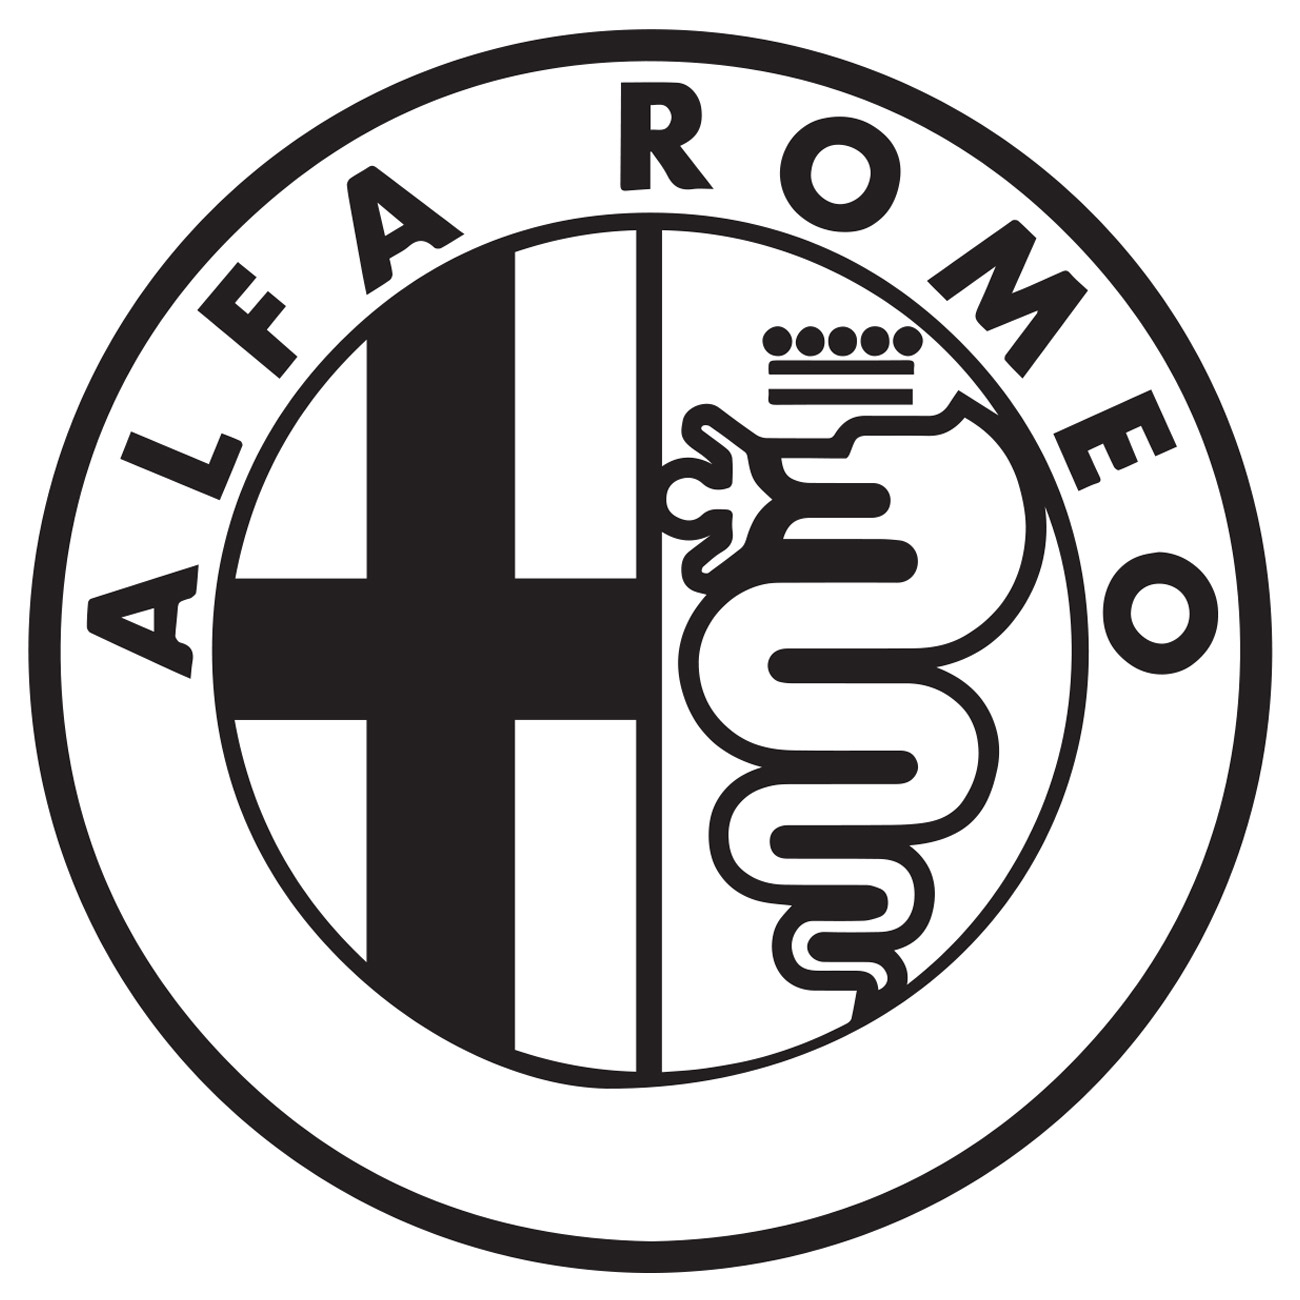 alfa romeo logo - vis alle stickers